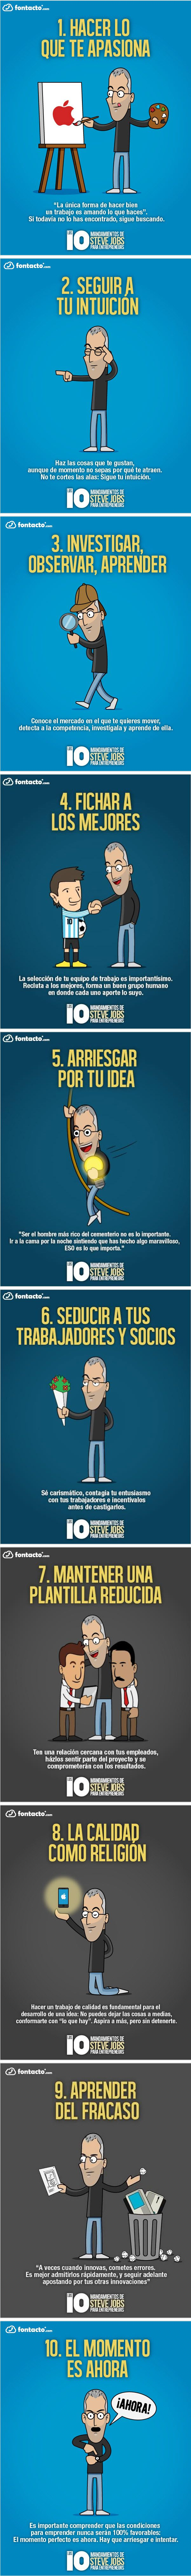 10 mandamientos de Steve Jobs para emprendedores.